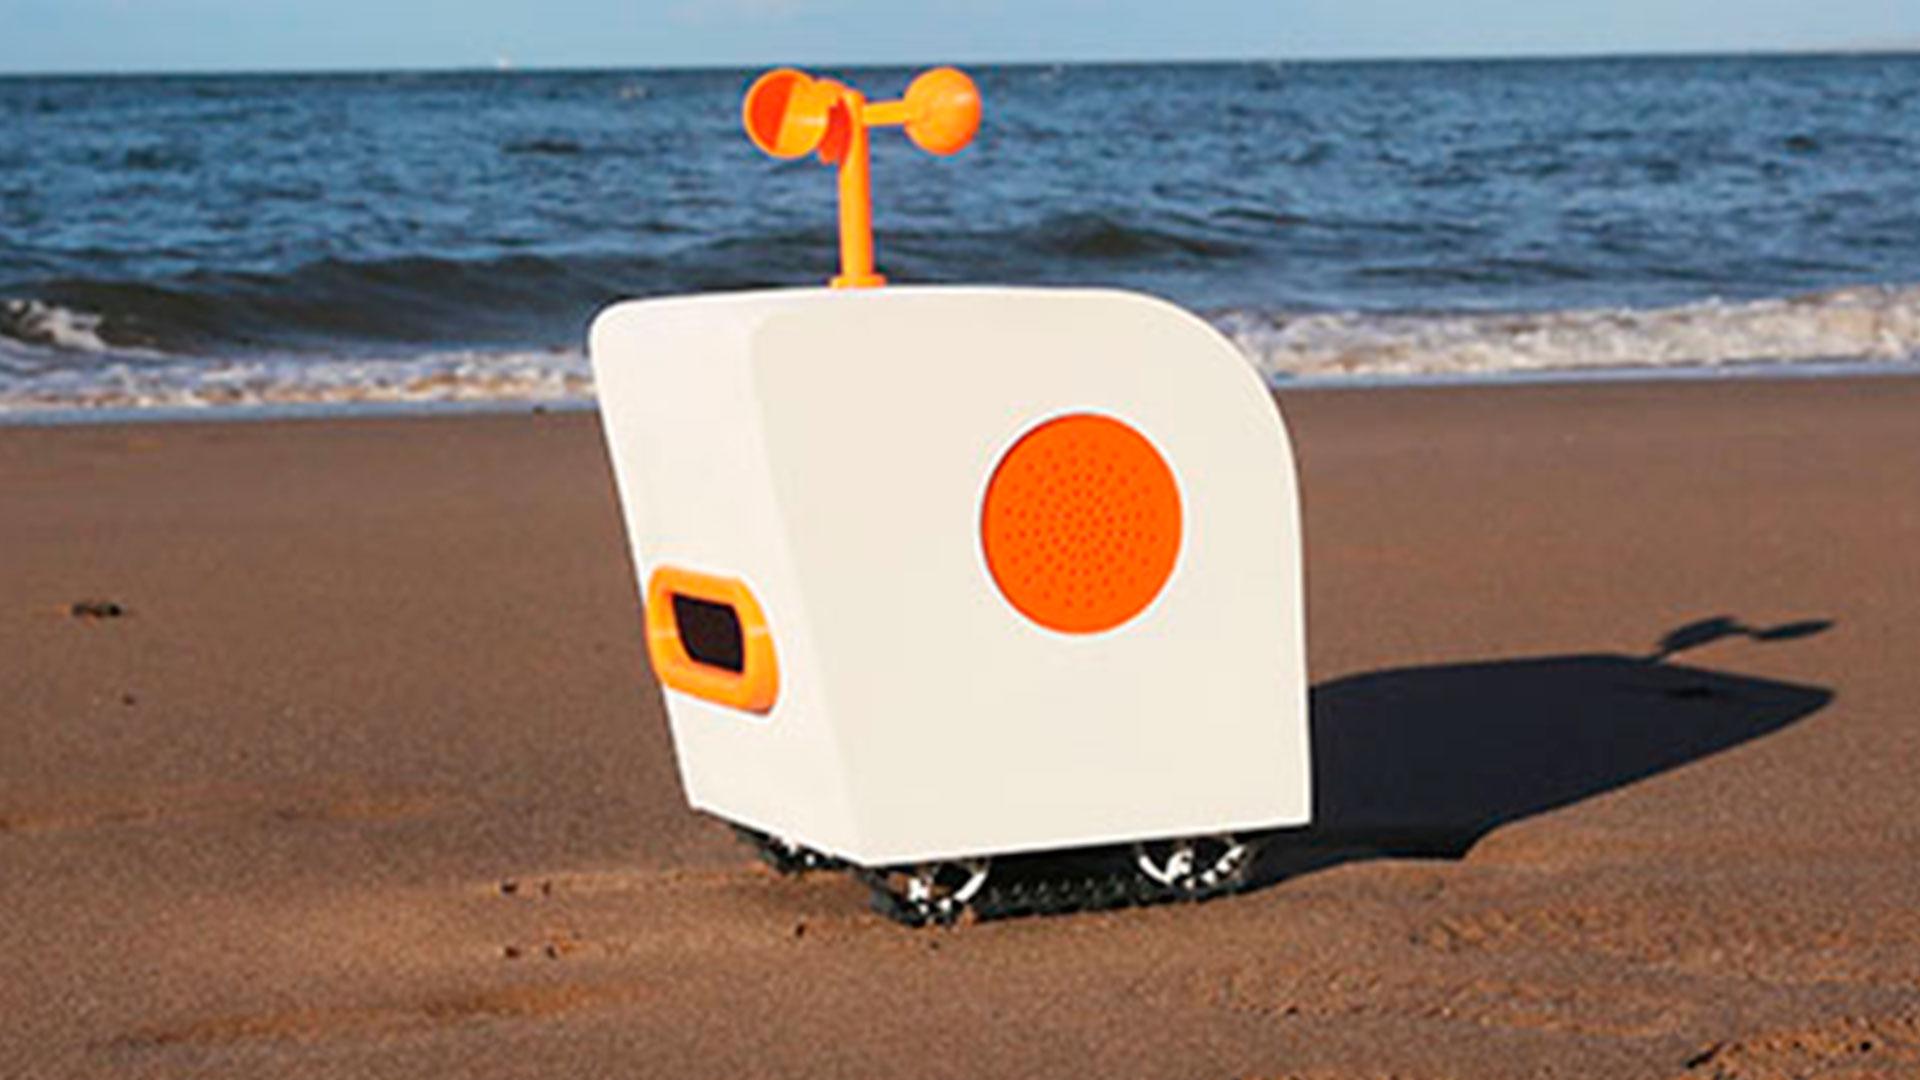 Robot poeta hero asset